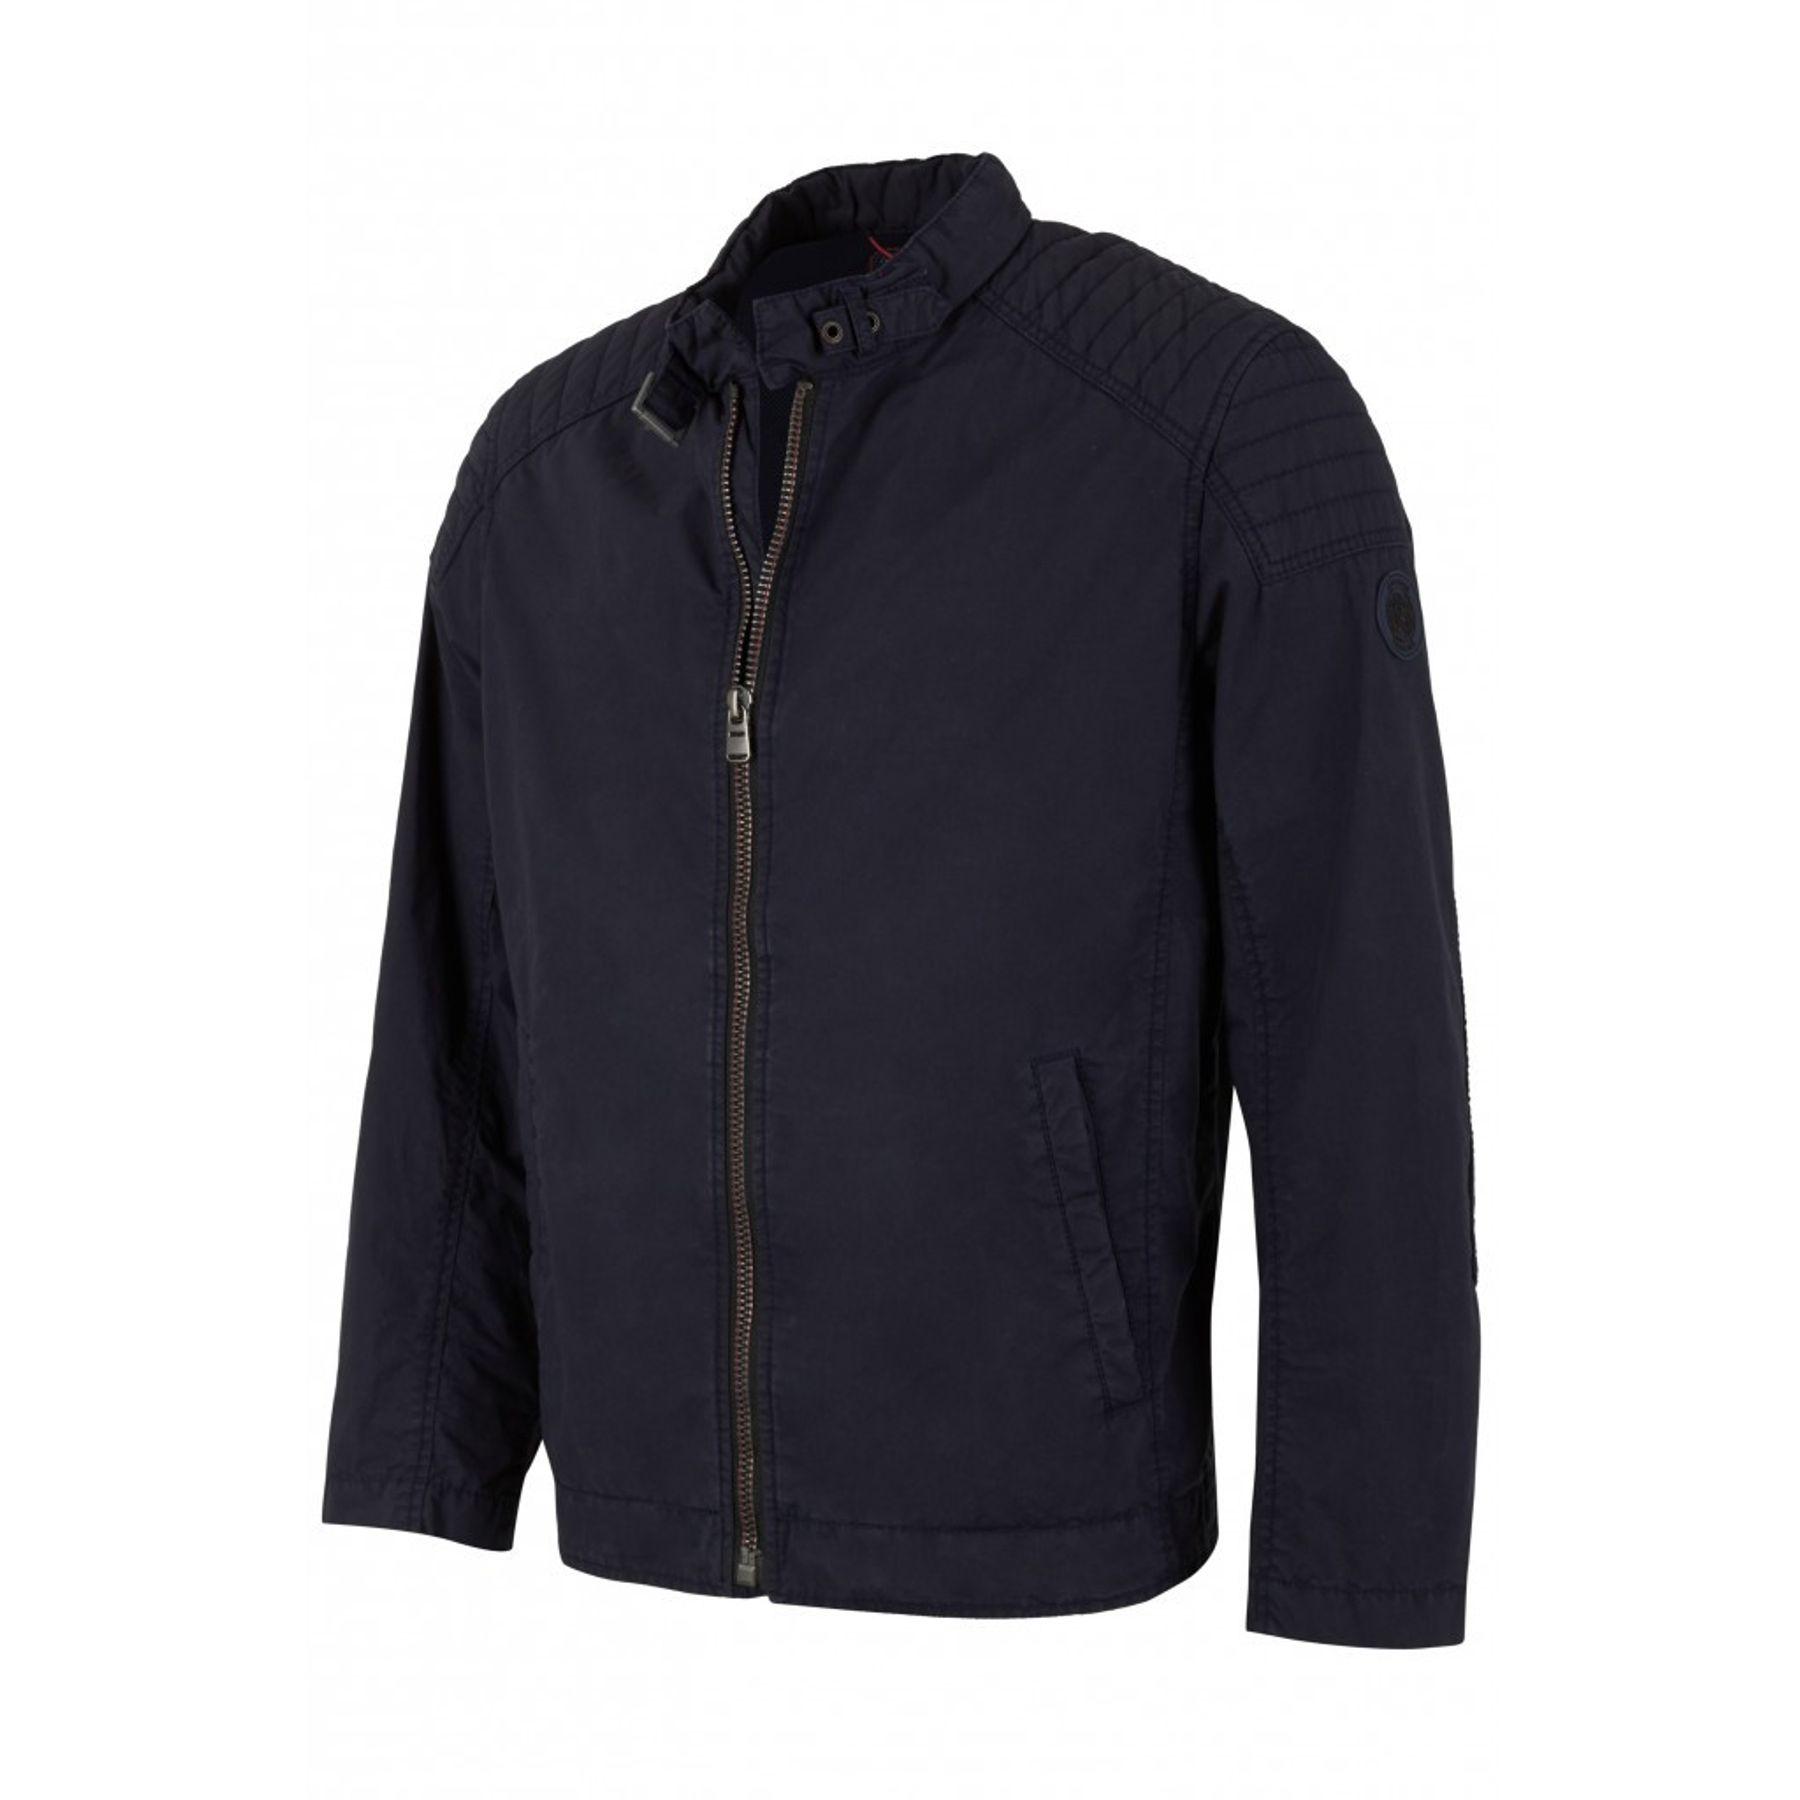 Calamar - Herren Jacke im Biker-Style, F S (130100 5149) 3b95726f64